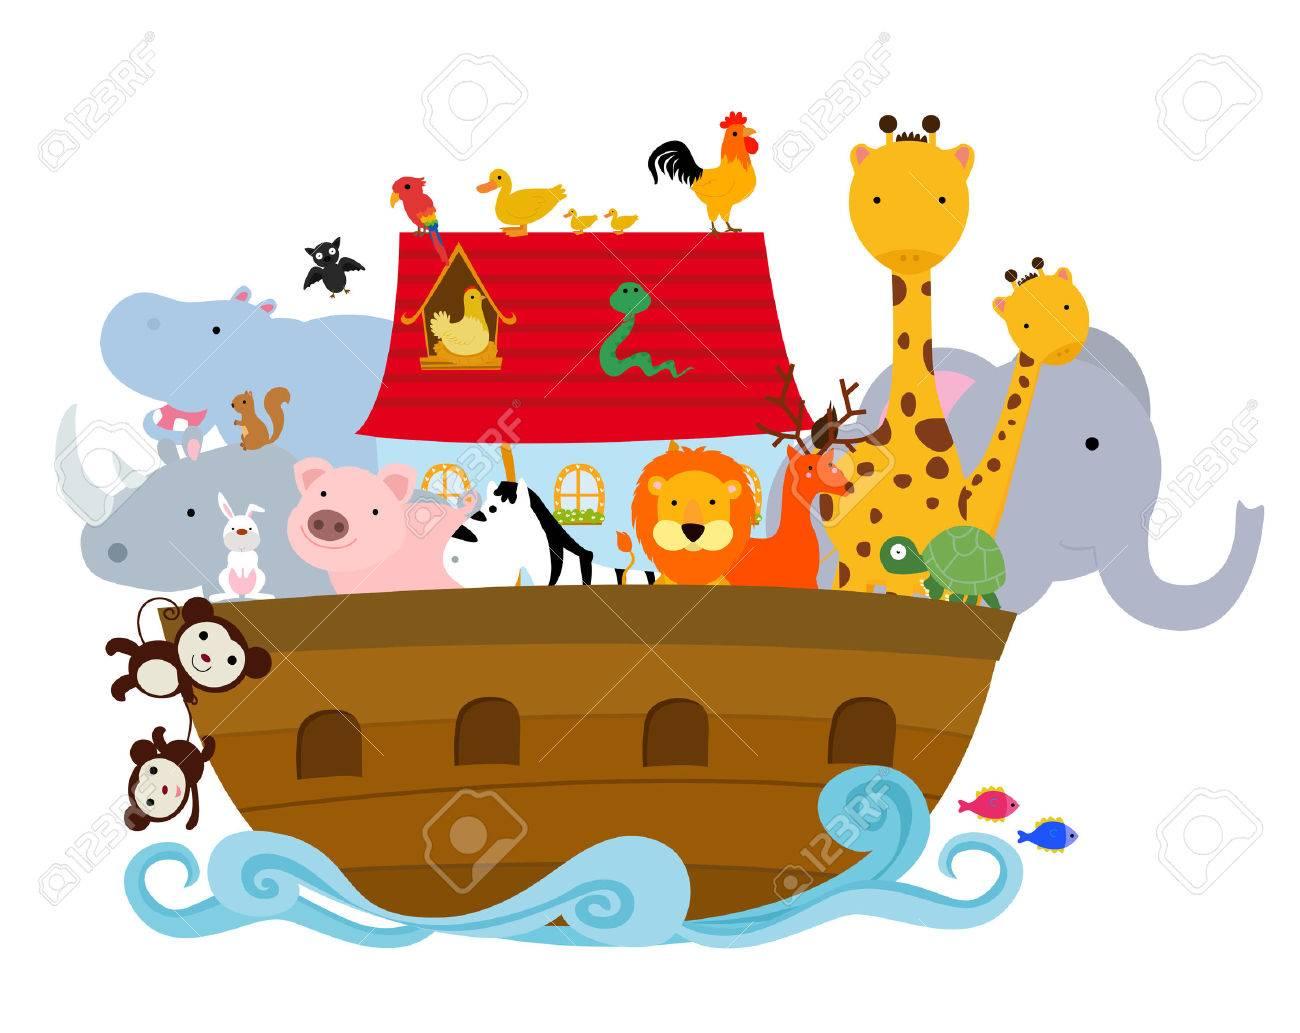 noah s ark royalty free cliparts vectors and stock illustration rh 123rf com noah's ark clipart black and white noah's ark clip art images